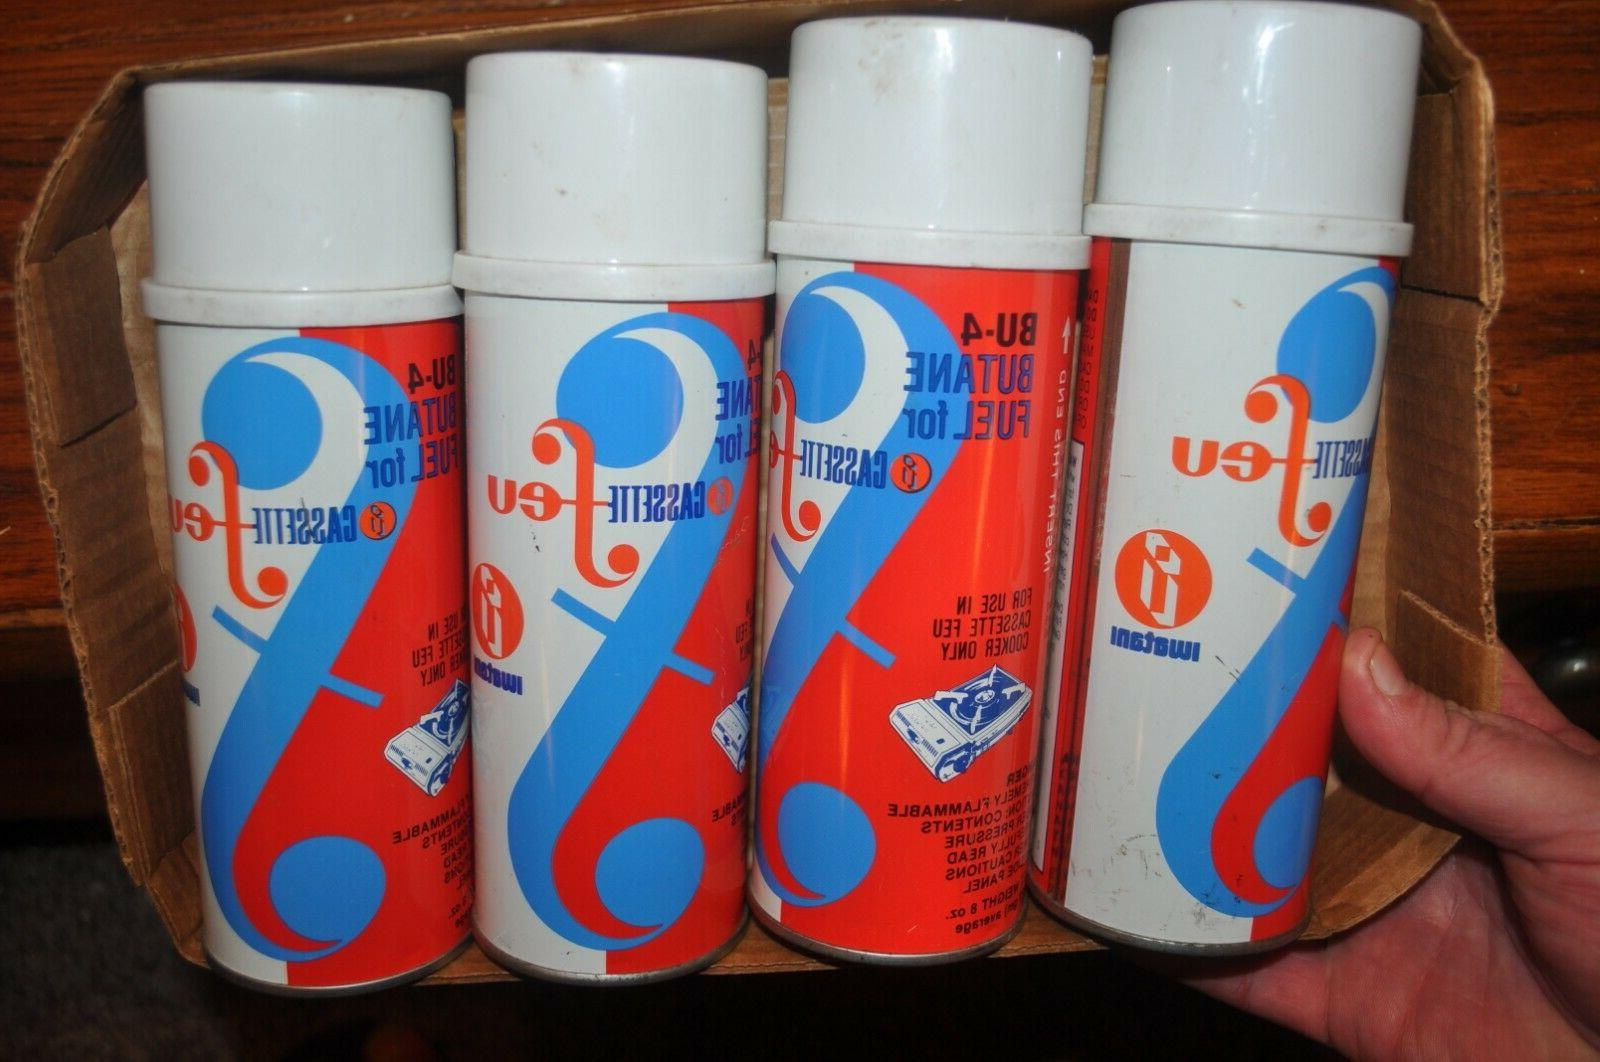 4 cassette feu butane fuel gas canisters